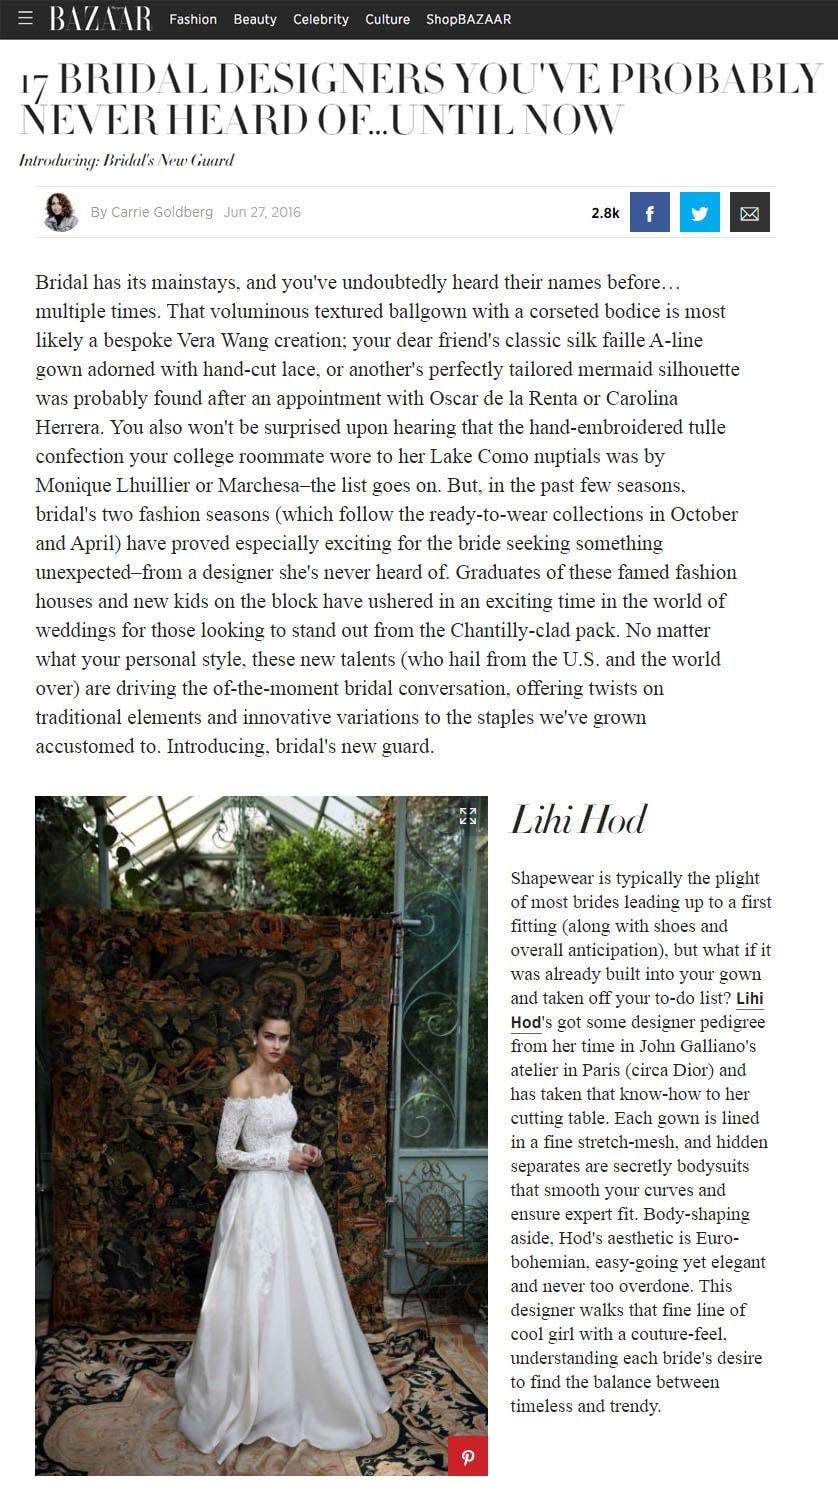 Harper Bazaar's New Designers: 17 Bridal Designers You've Probably Never Heard Of... Until Now